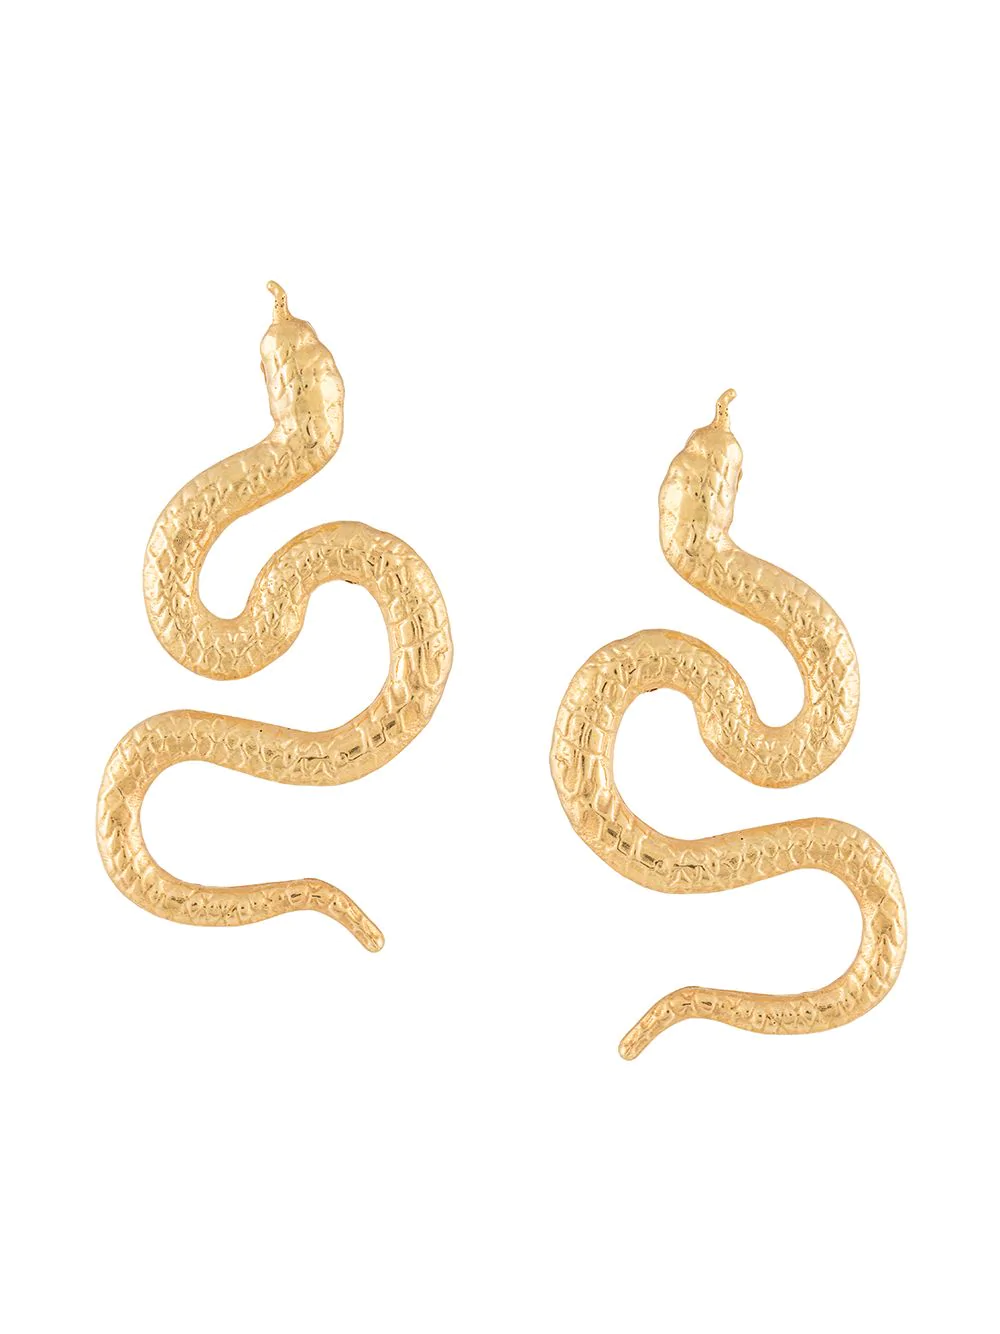 Natia X Lako Small Snake Earrings In Gold